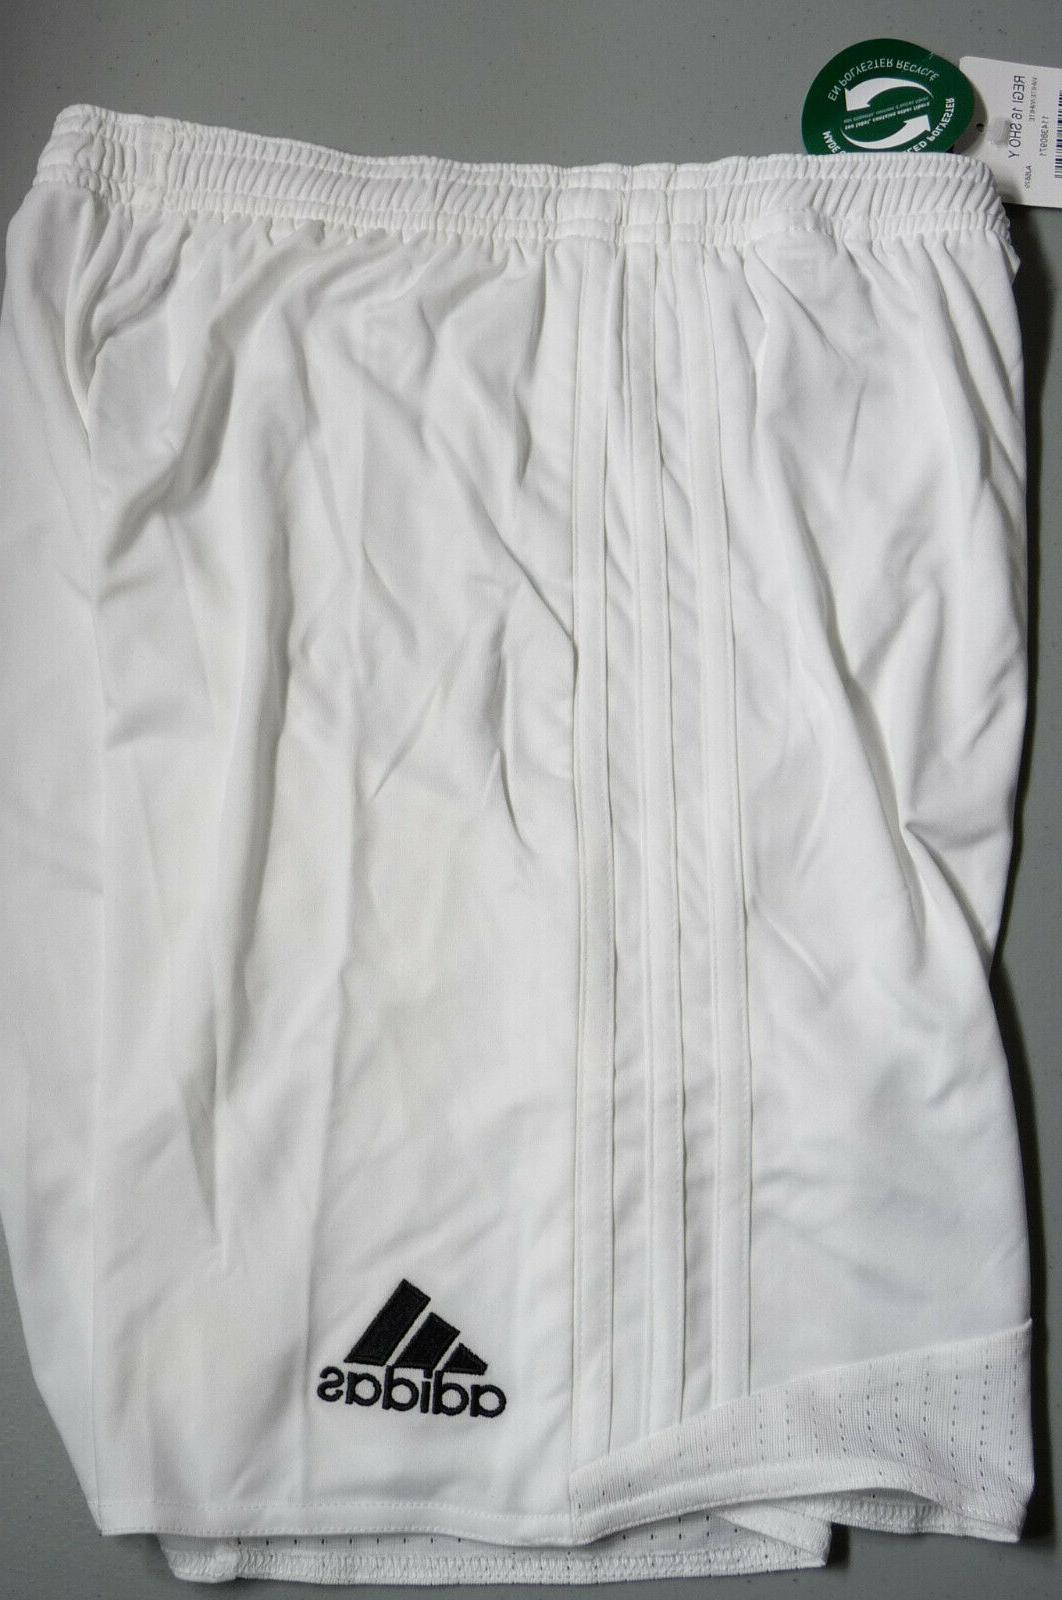 adidas Boys Soccer Shorts Colors Sizes Uniform